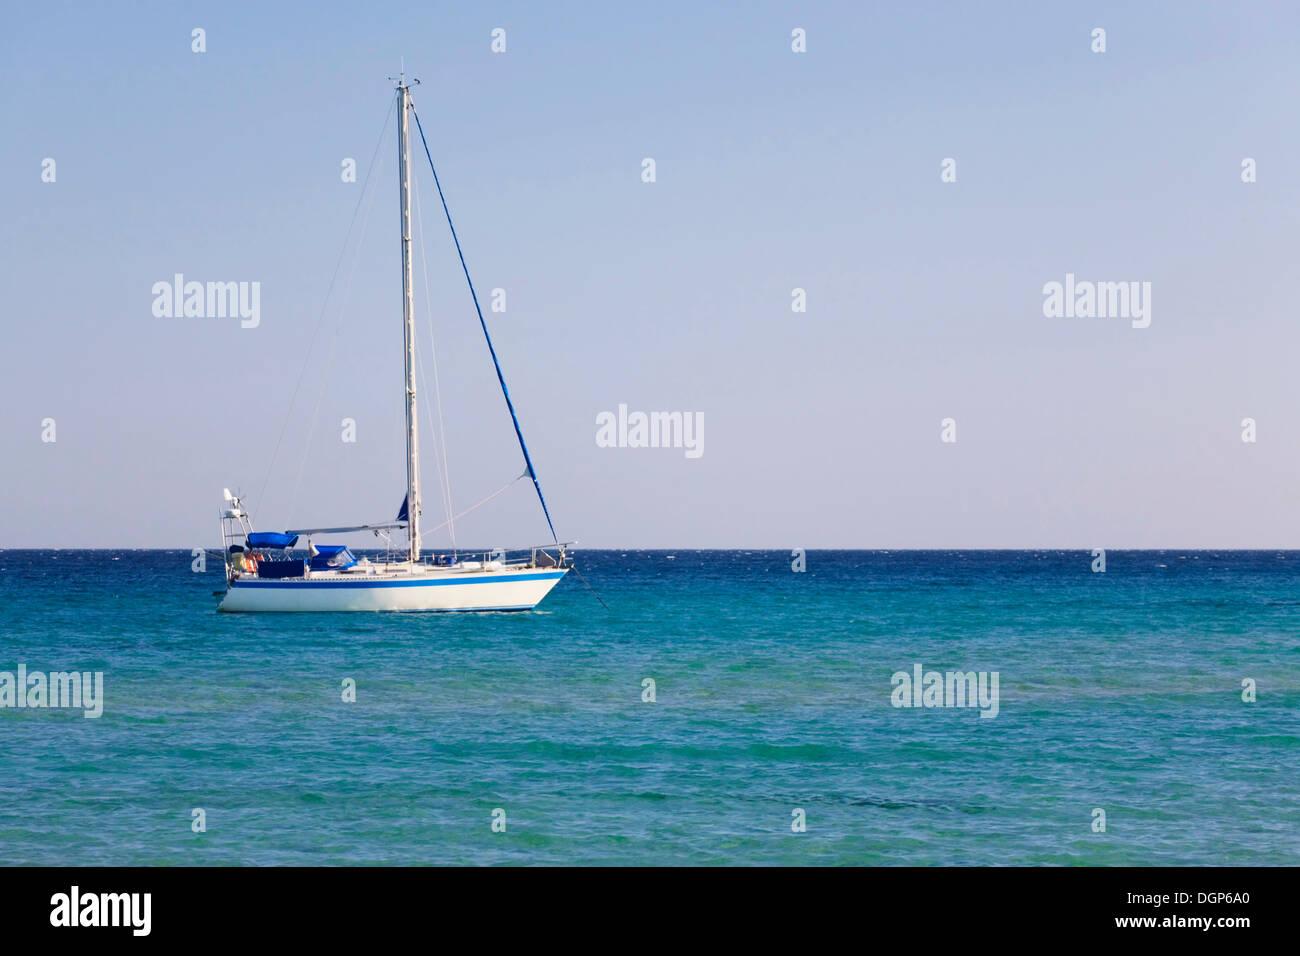 Sailboat on the Costa del Sud, Sulcis Province, Sardinia, Italy, Europe - Stock Image